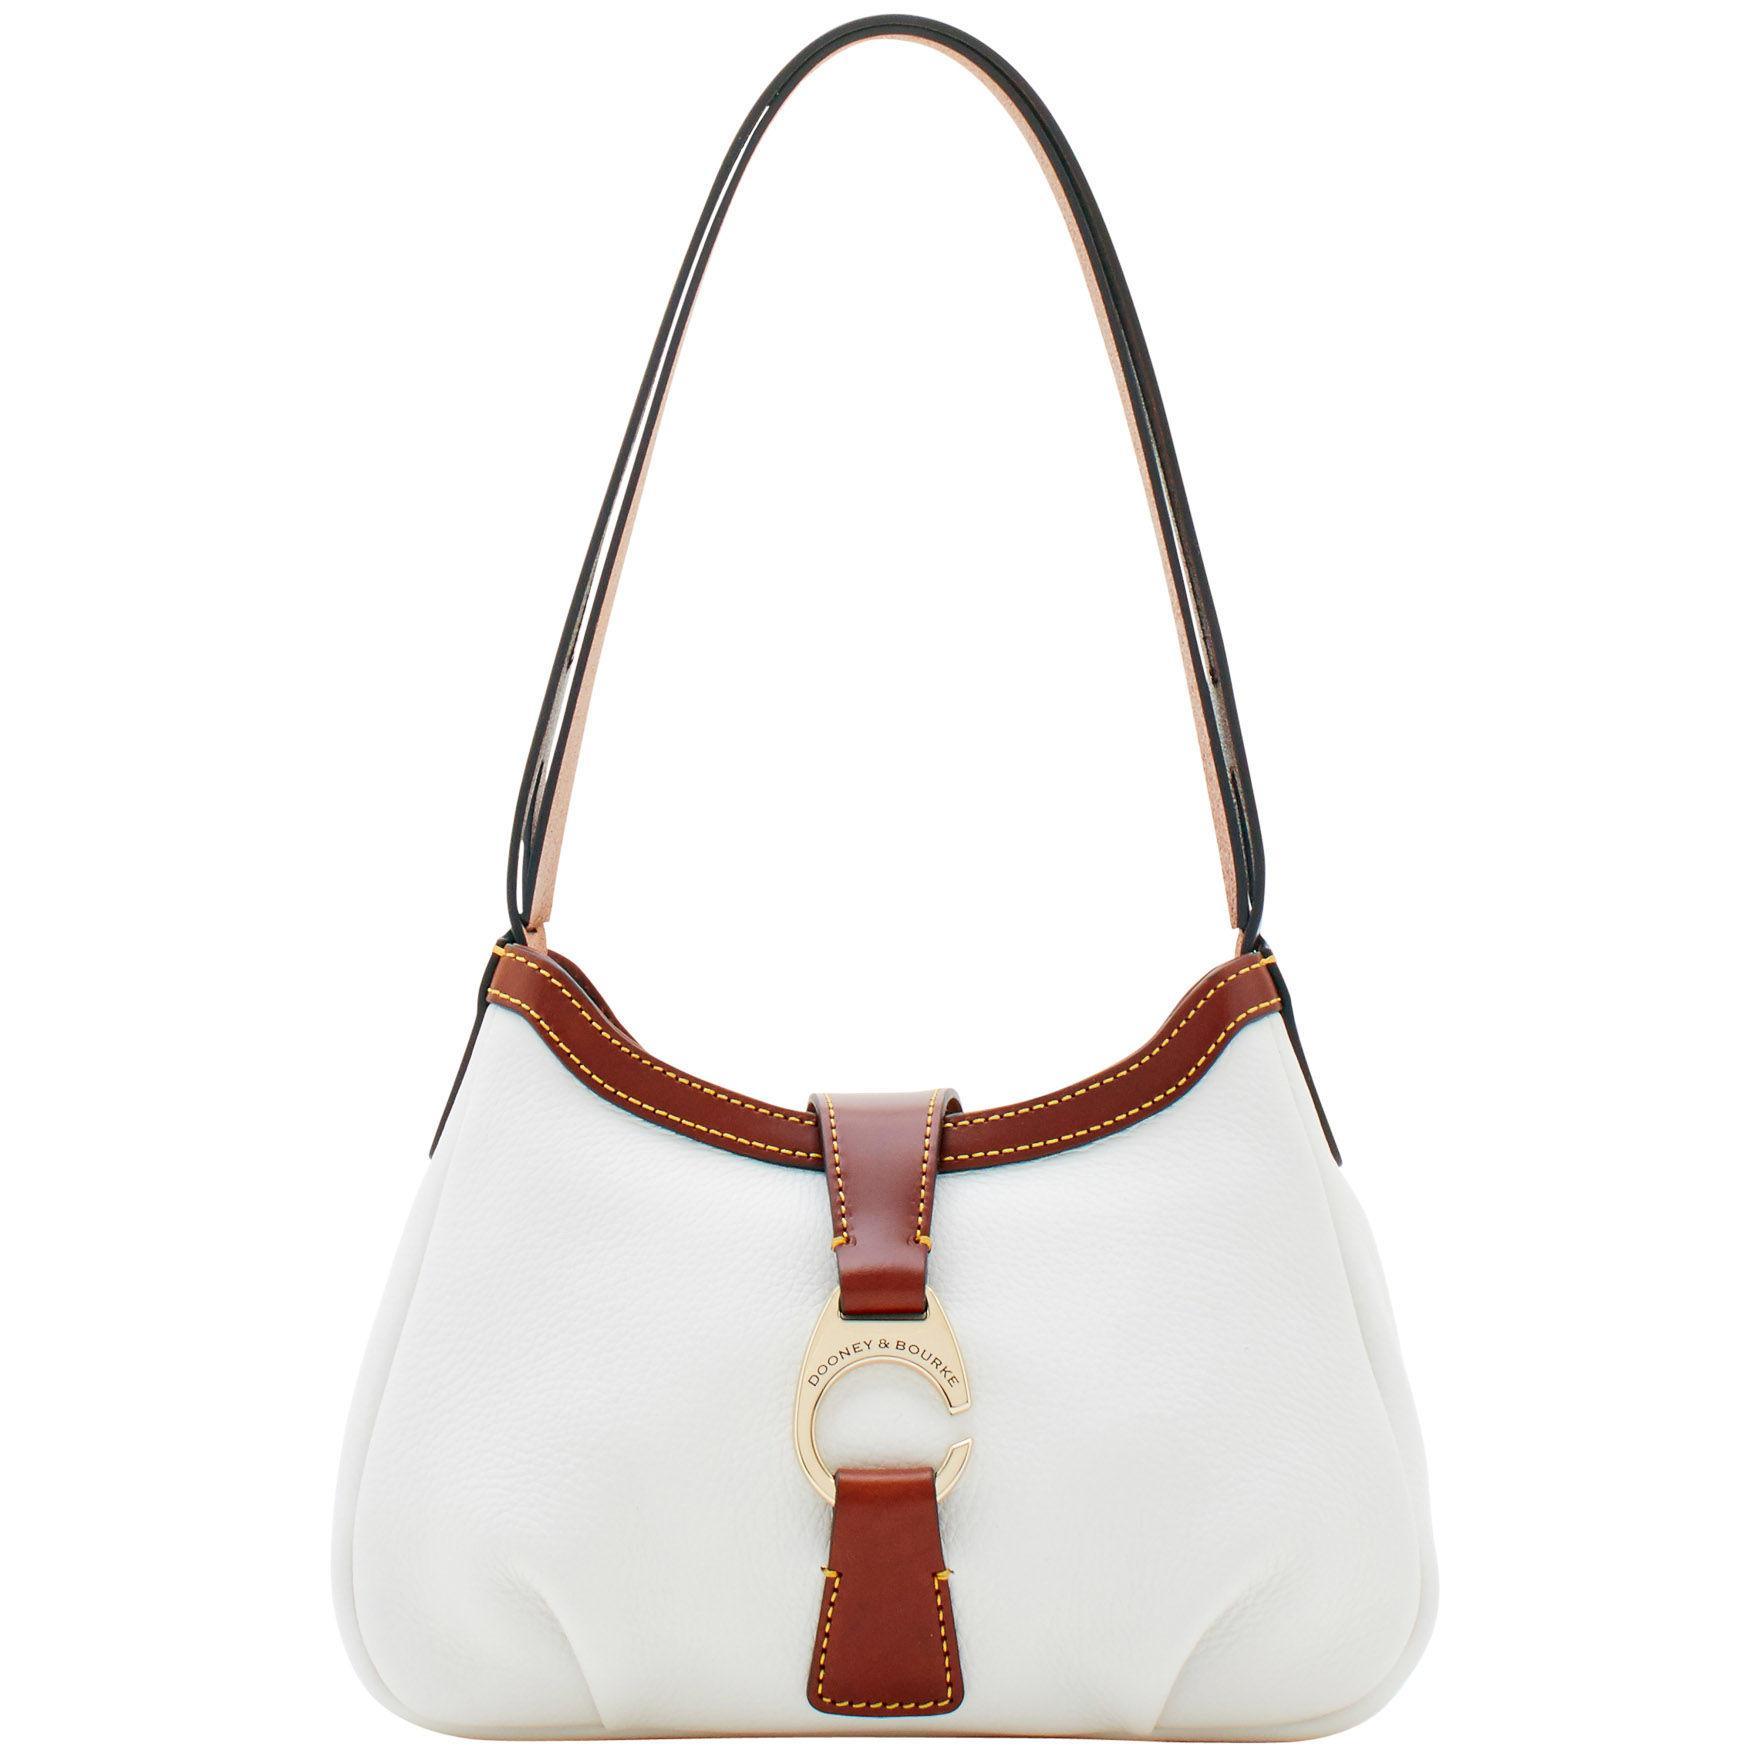 Lyst - Dooney   Bourke Derby Pebble Shoulder Bag in White - Save 20% d75dedf0c796d